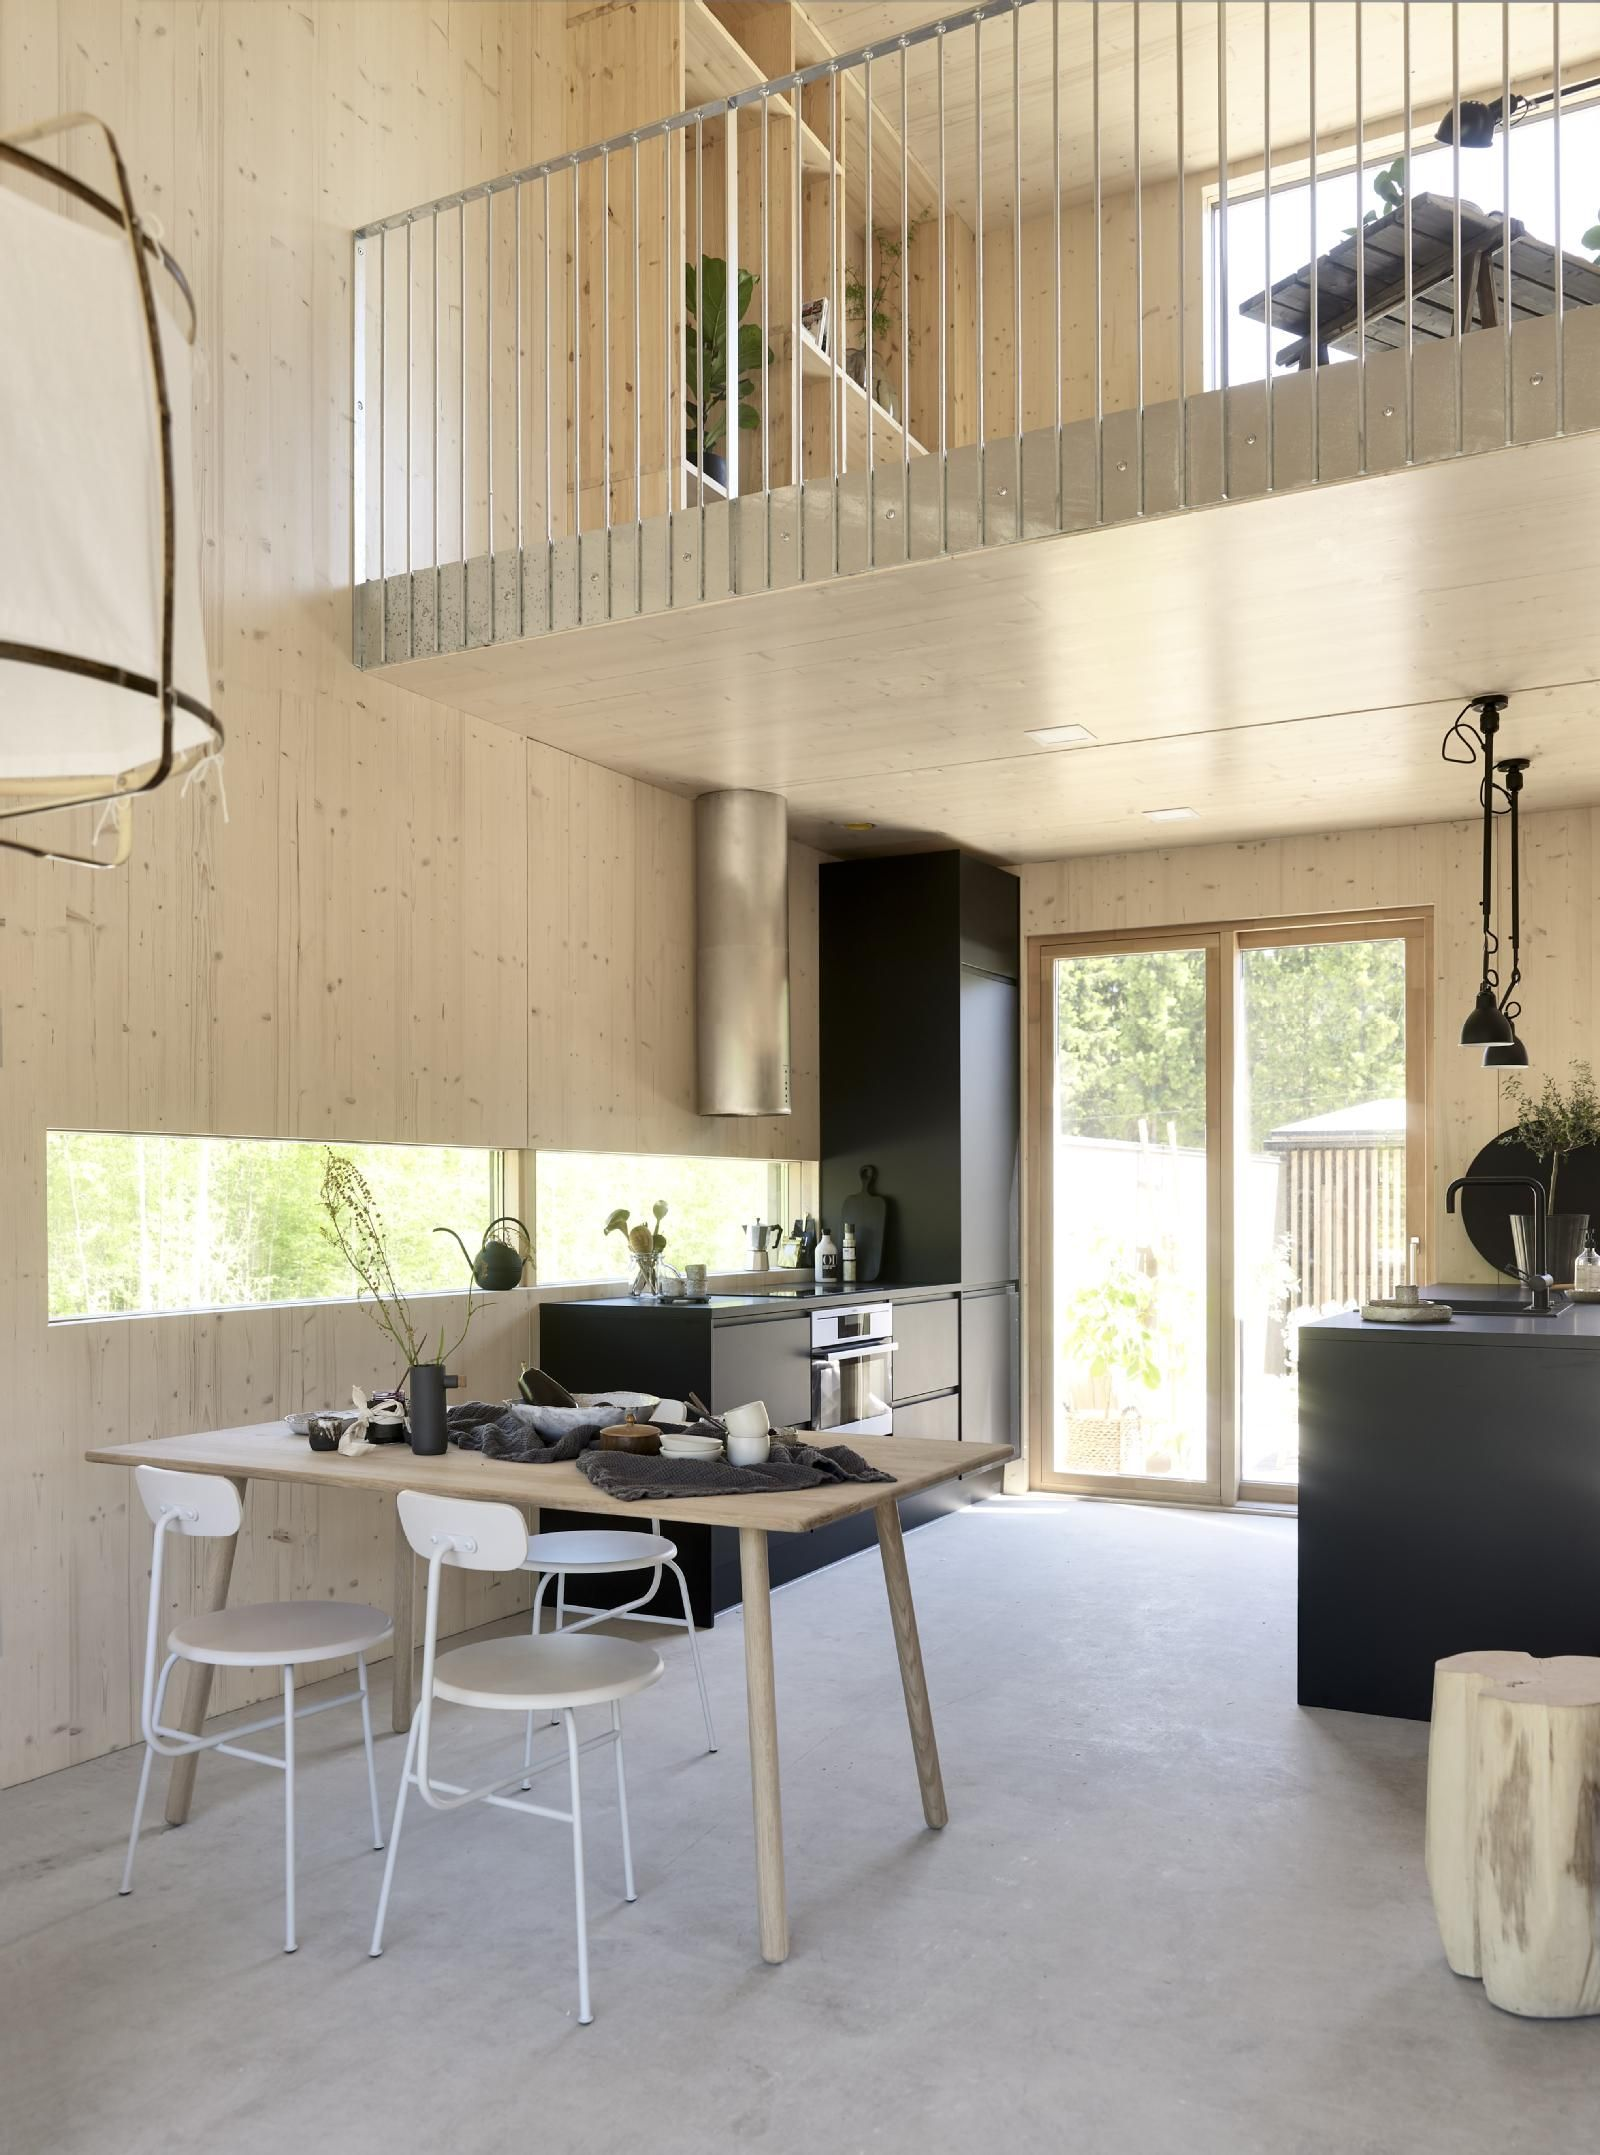 Kotola 91 m2 scandinavian raw interior design